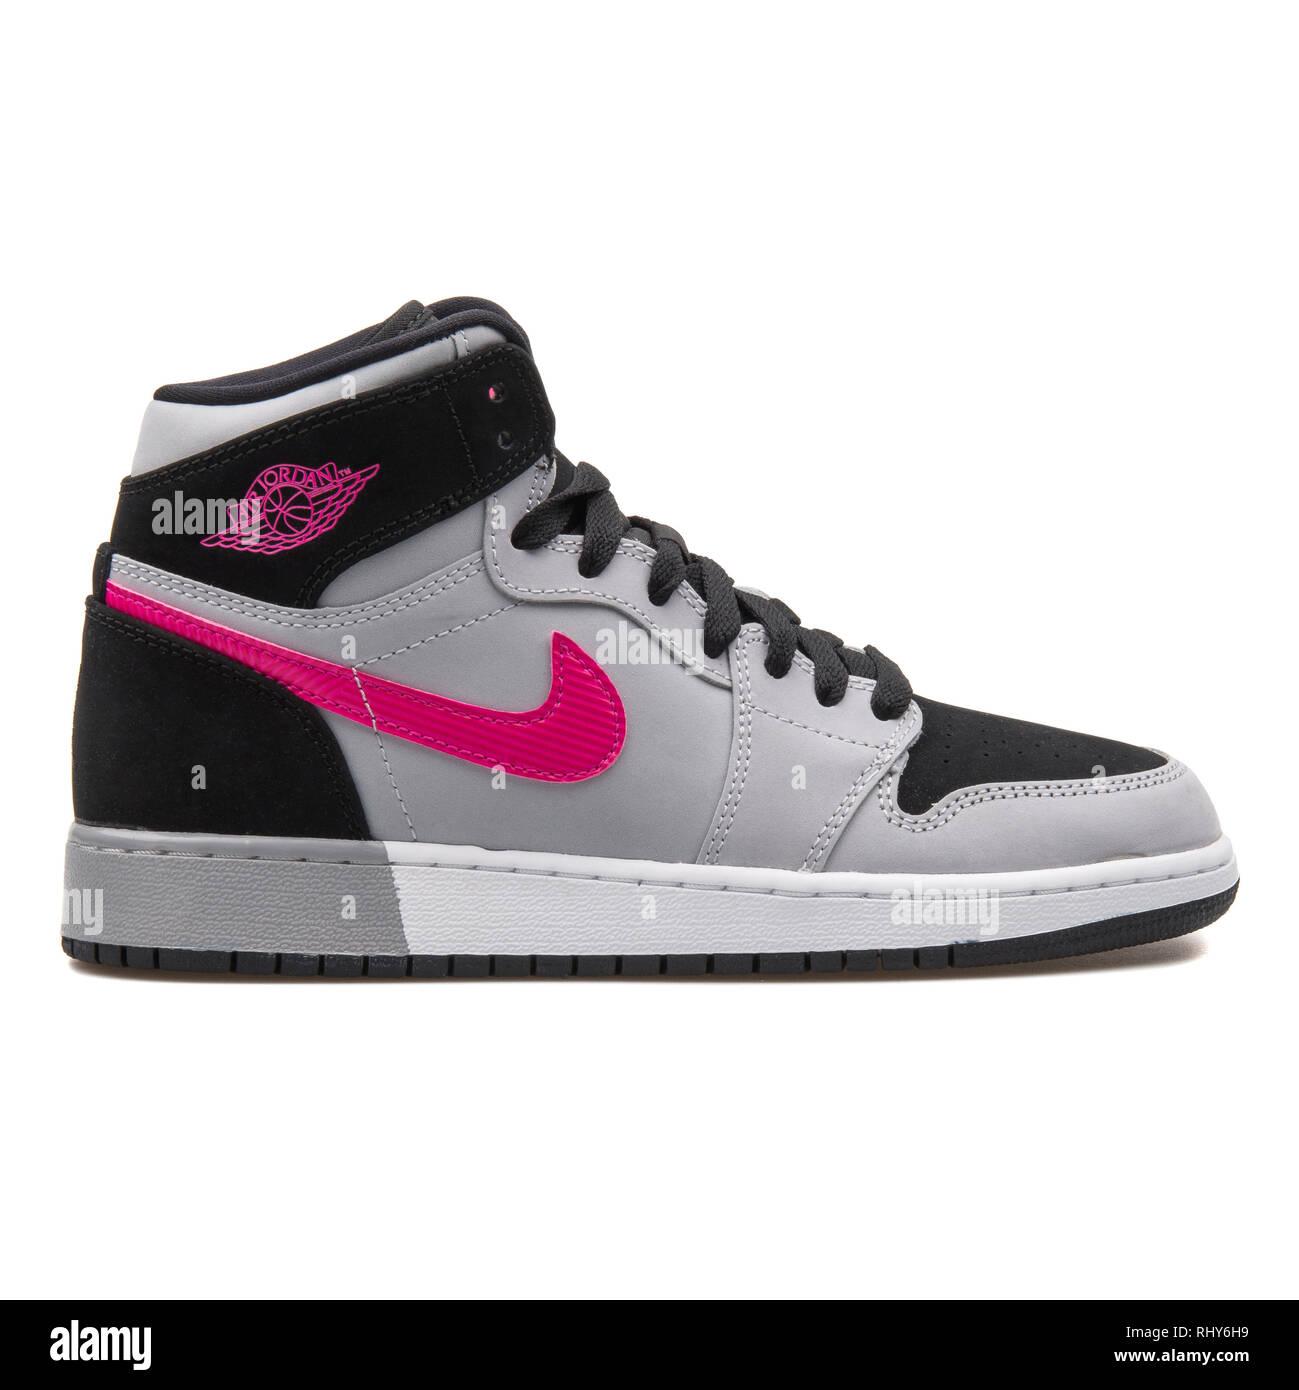 quality design 4aa63 91c04 VIENNA, AUSTRIA - AUGUST 7, 2017  Nike Air Jordan 1 Retro High GG grey,  black and pink sneaker on white background.